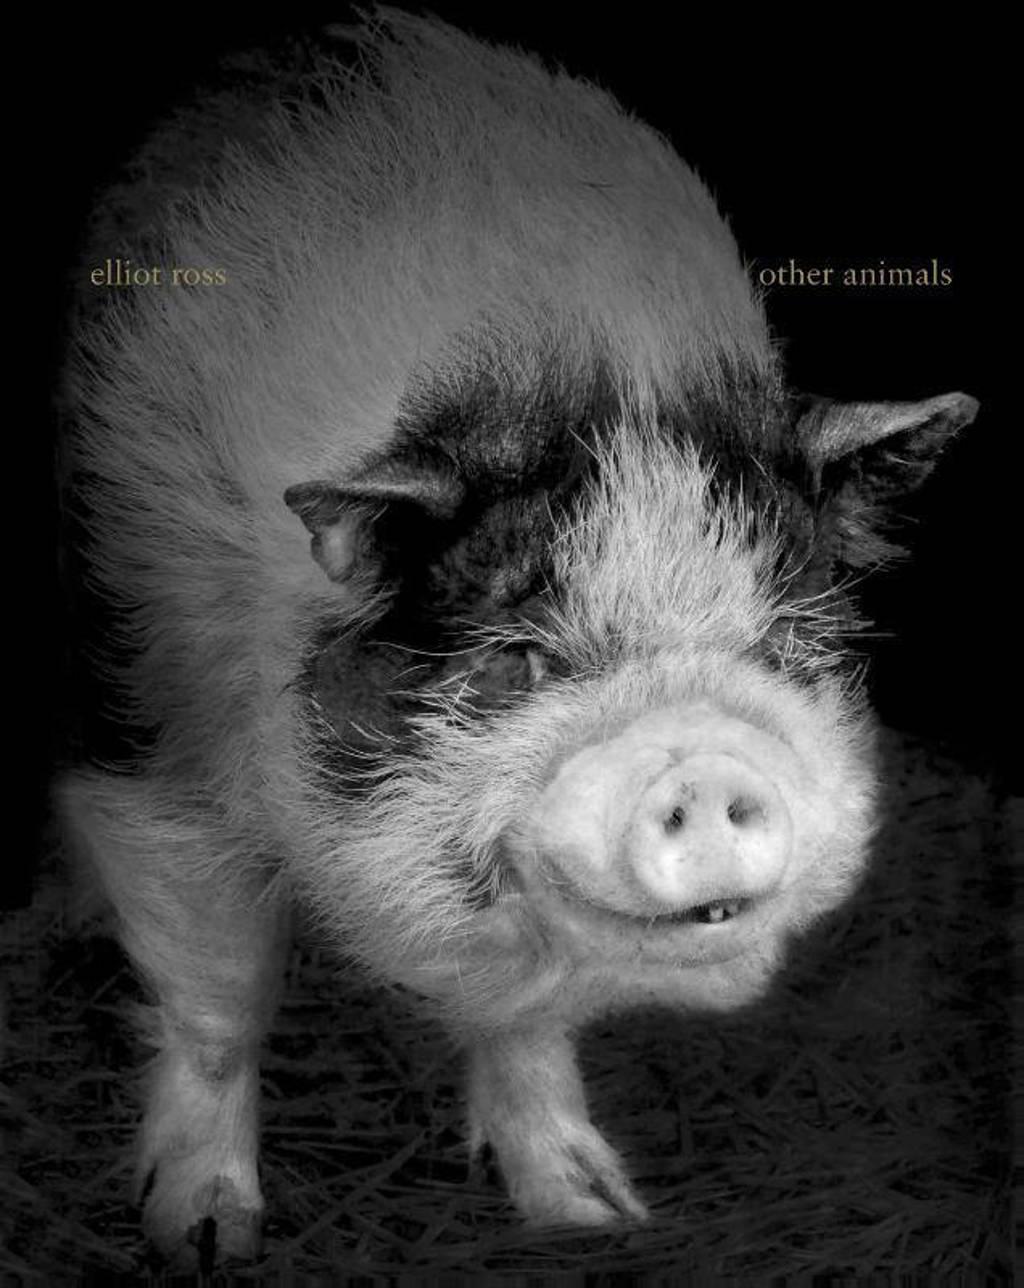 Other animals - Elliot Ross